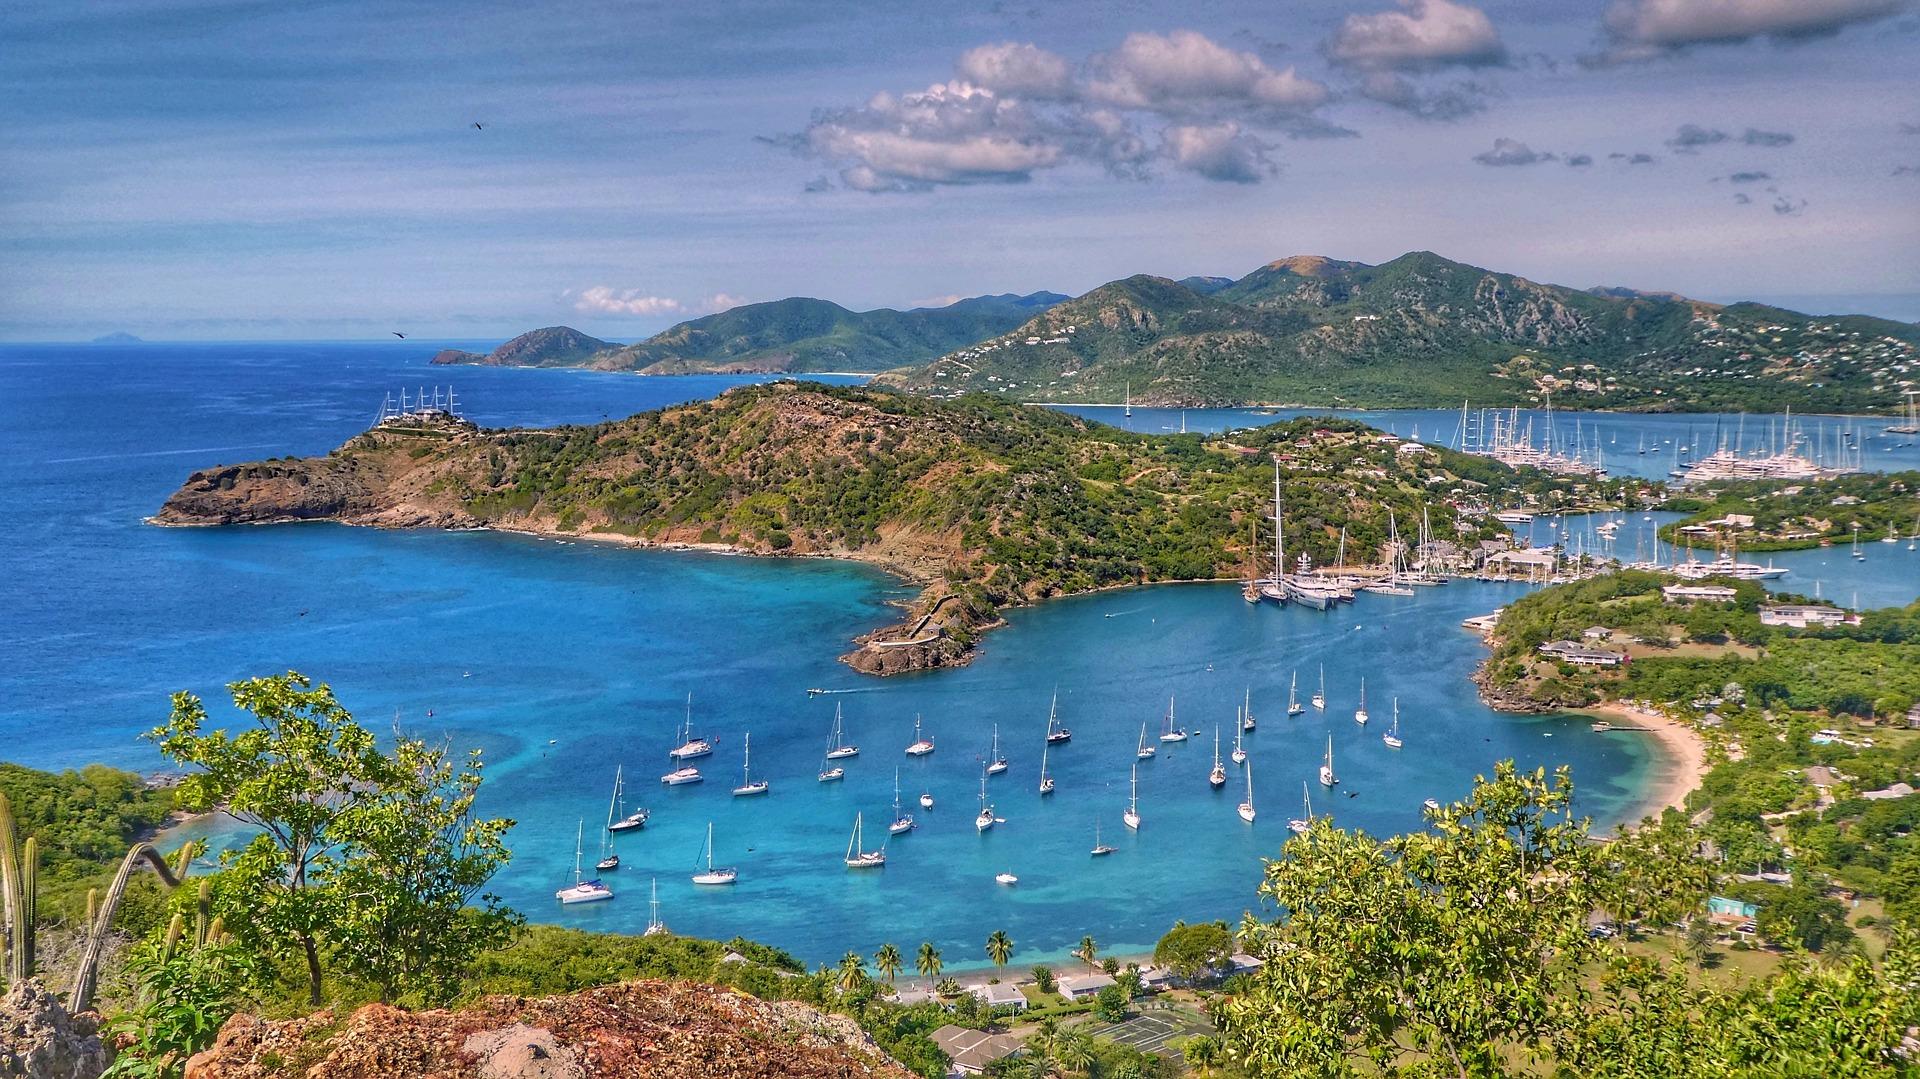 Antigua and Barbuda honeymoon destination